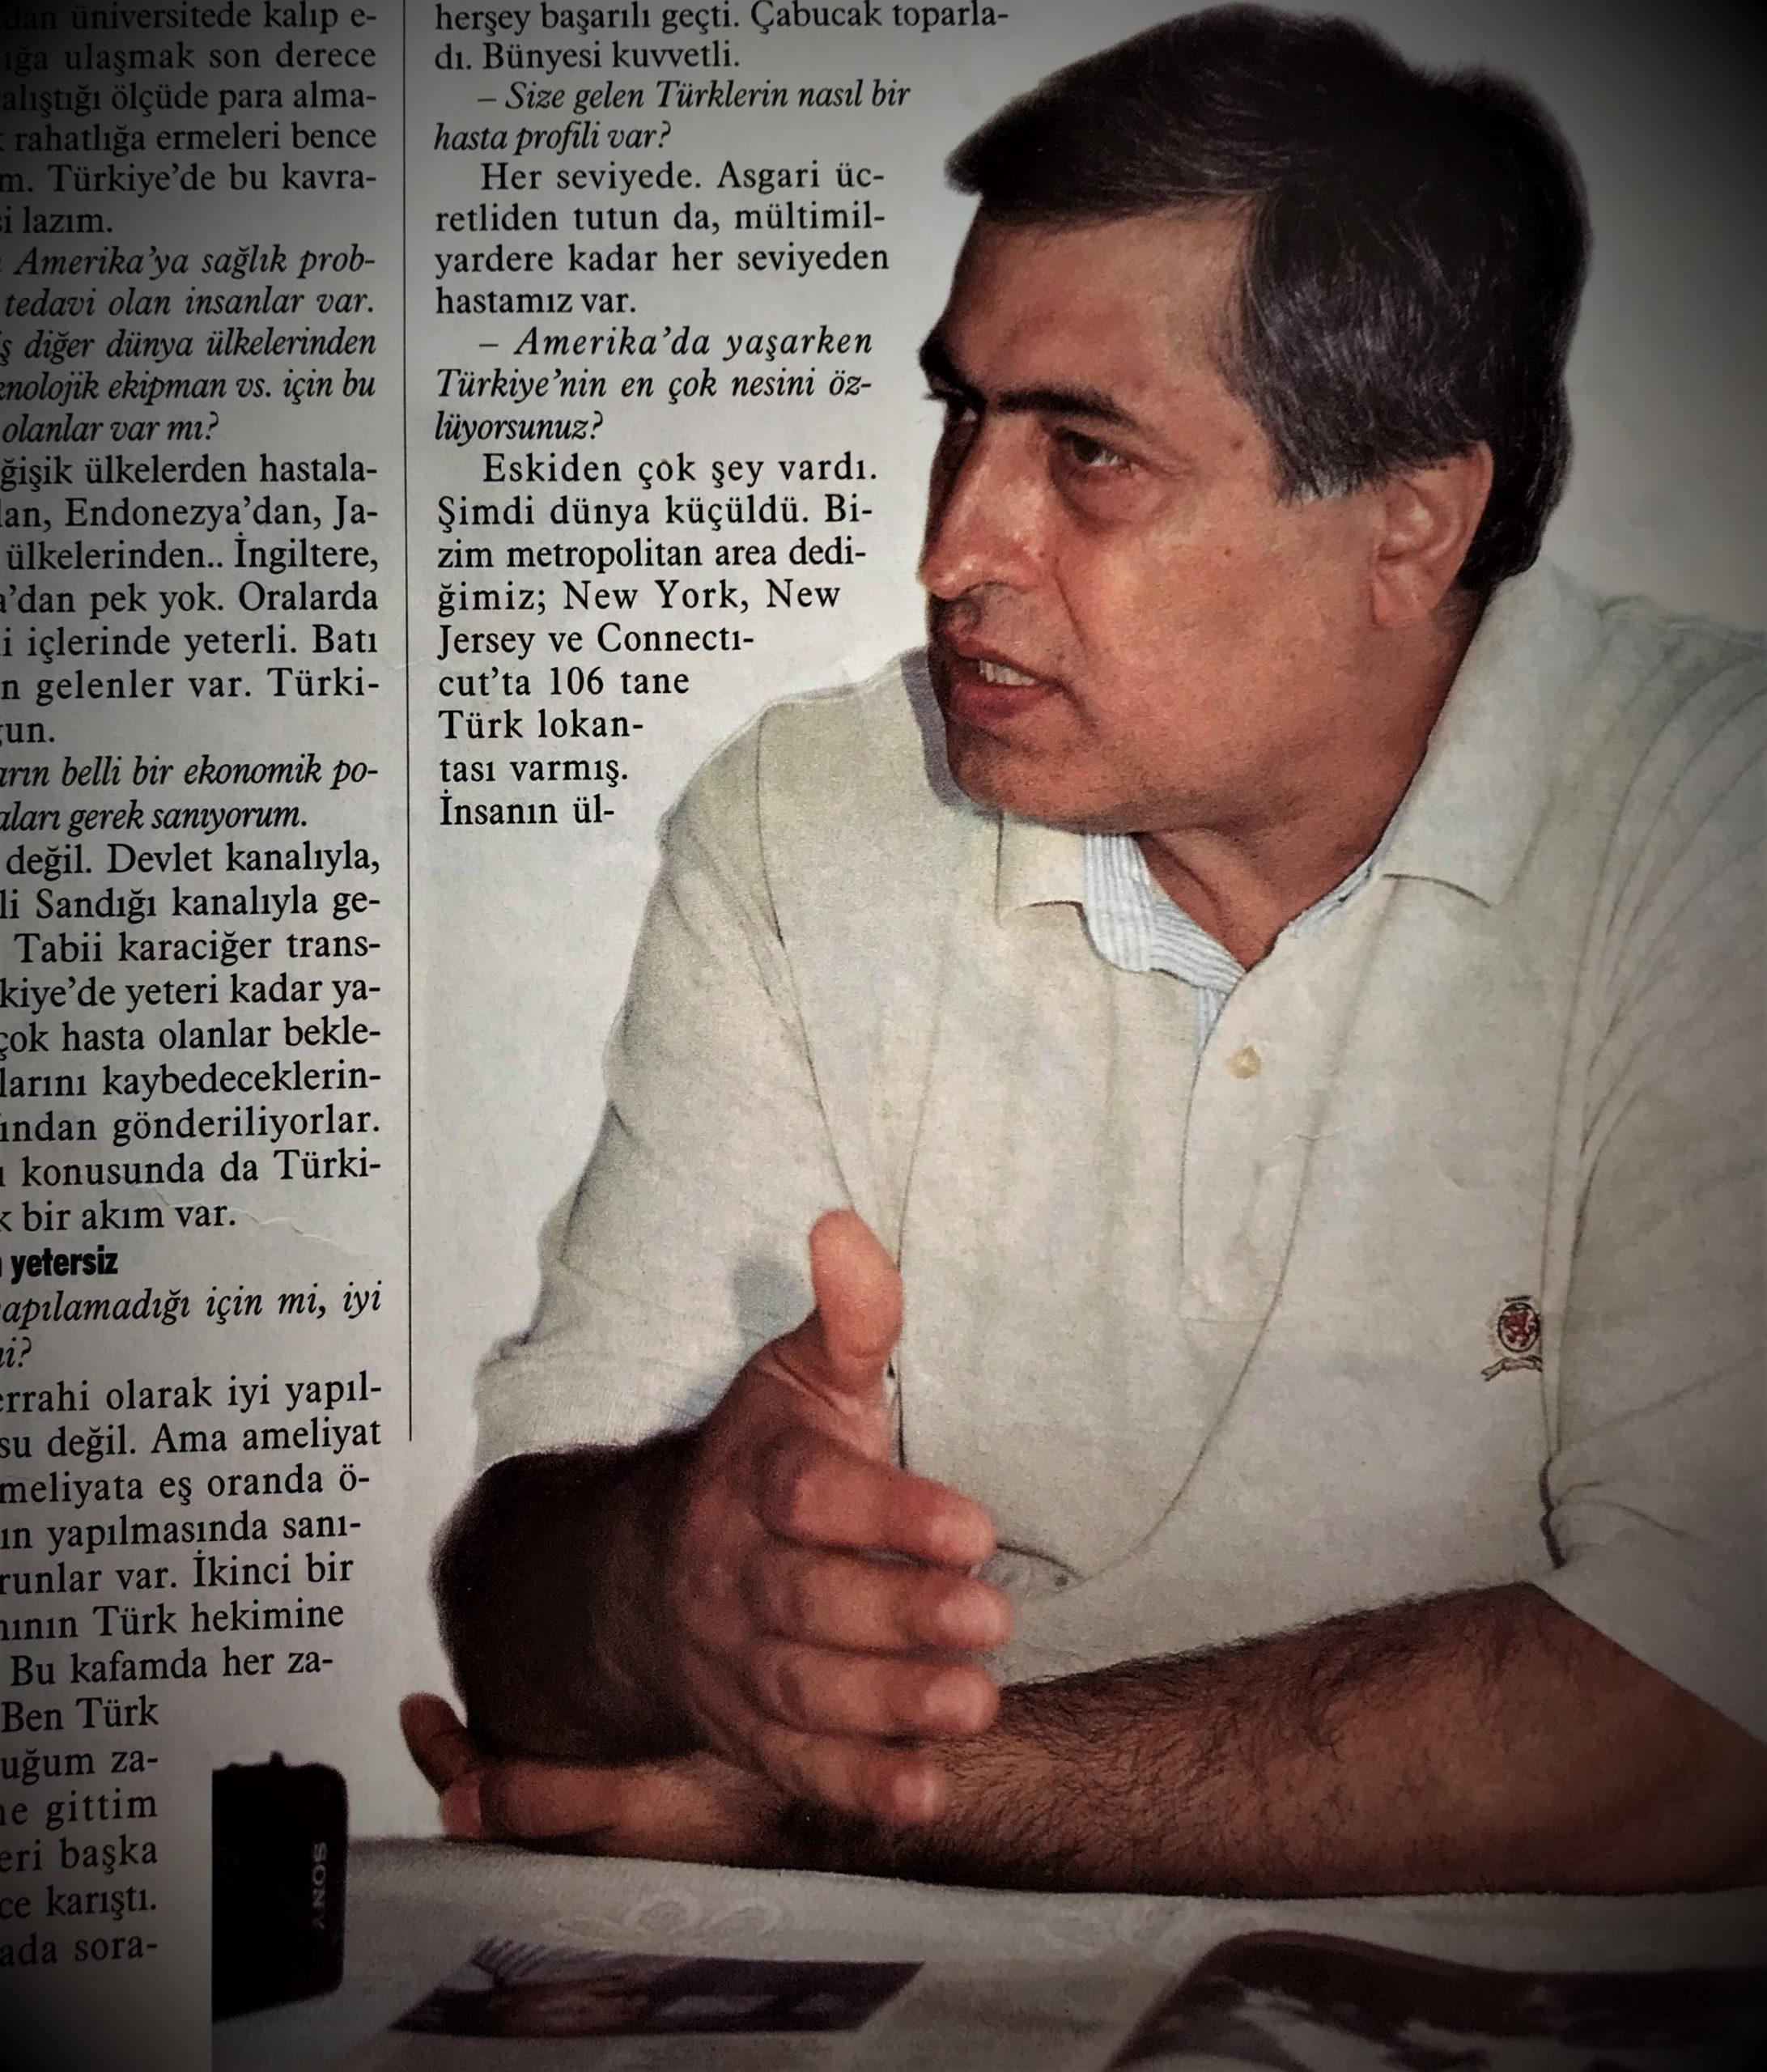 Prof. Dr Şükrü Emre